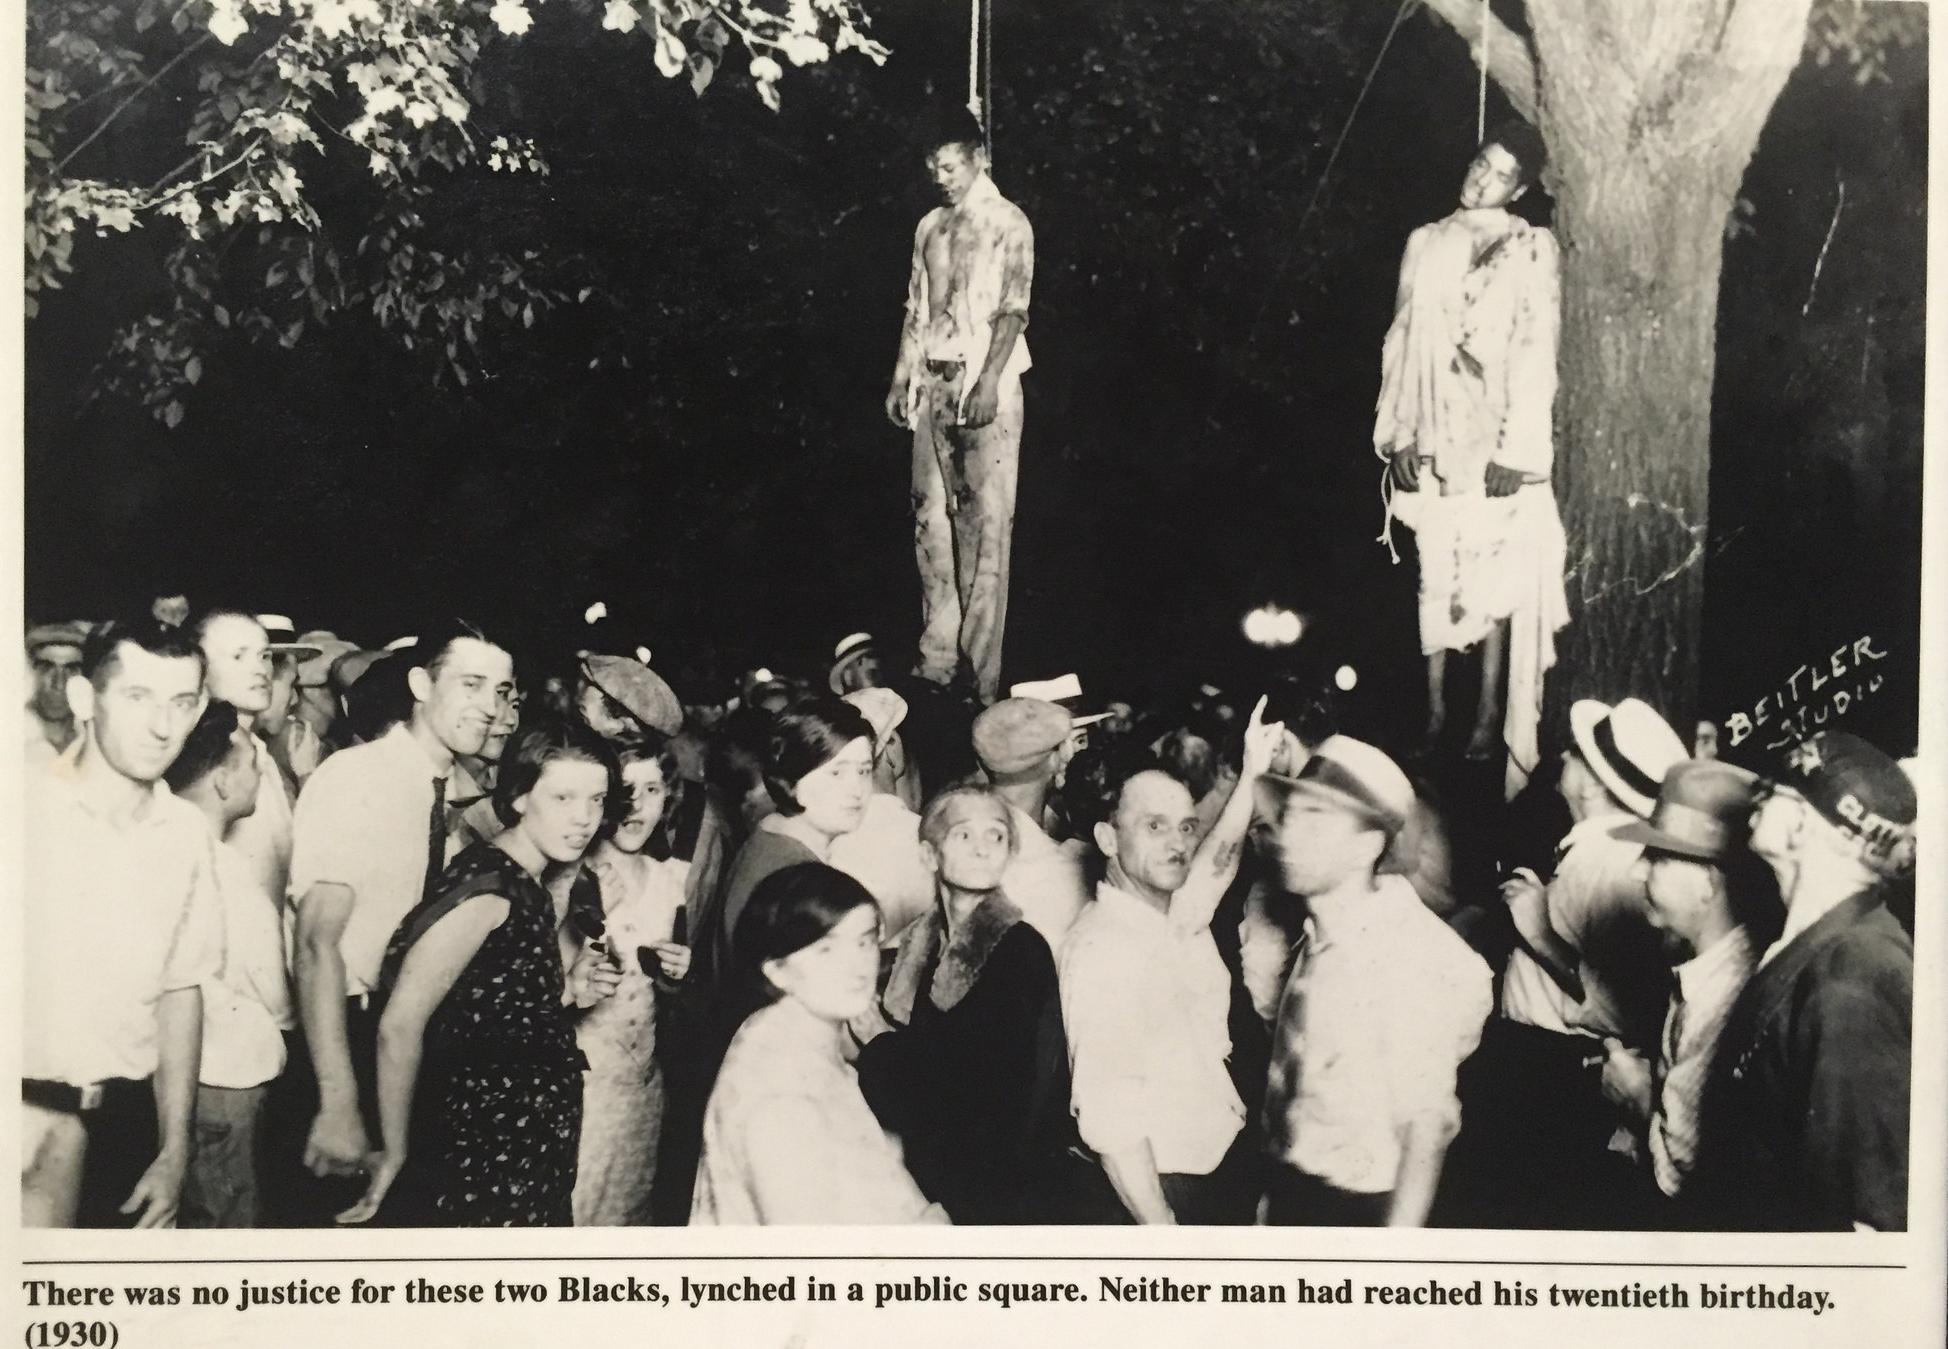 From the Birmingham Civil Rights Institute